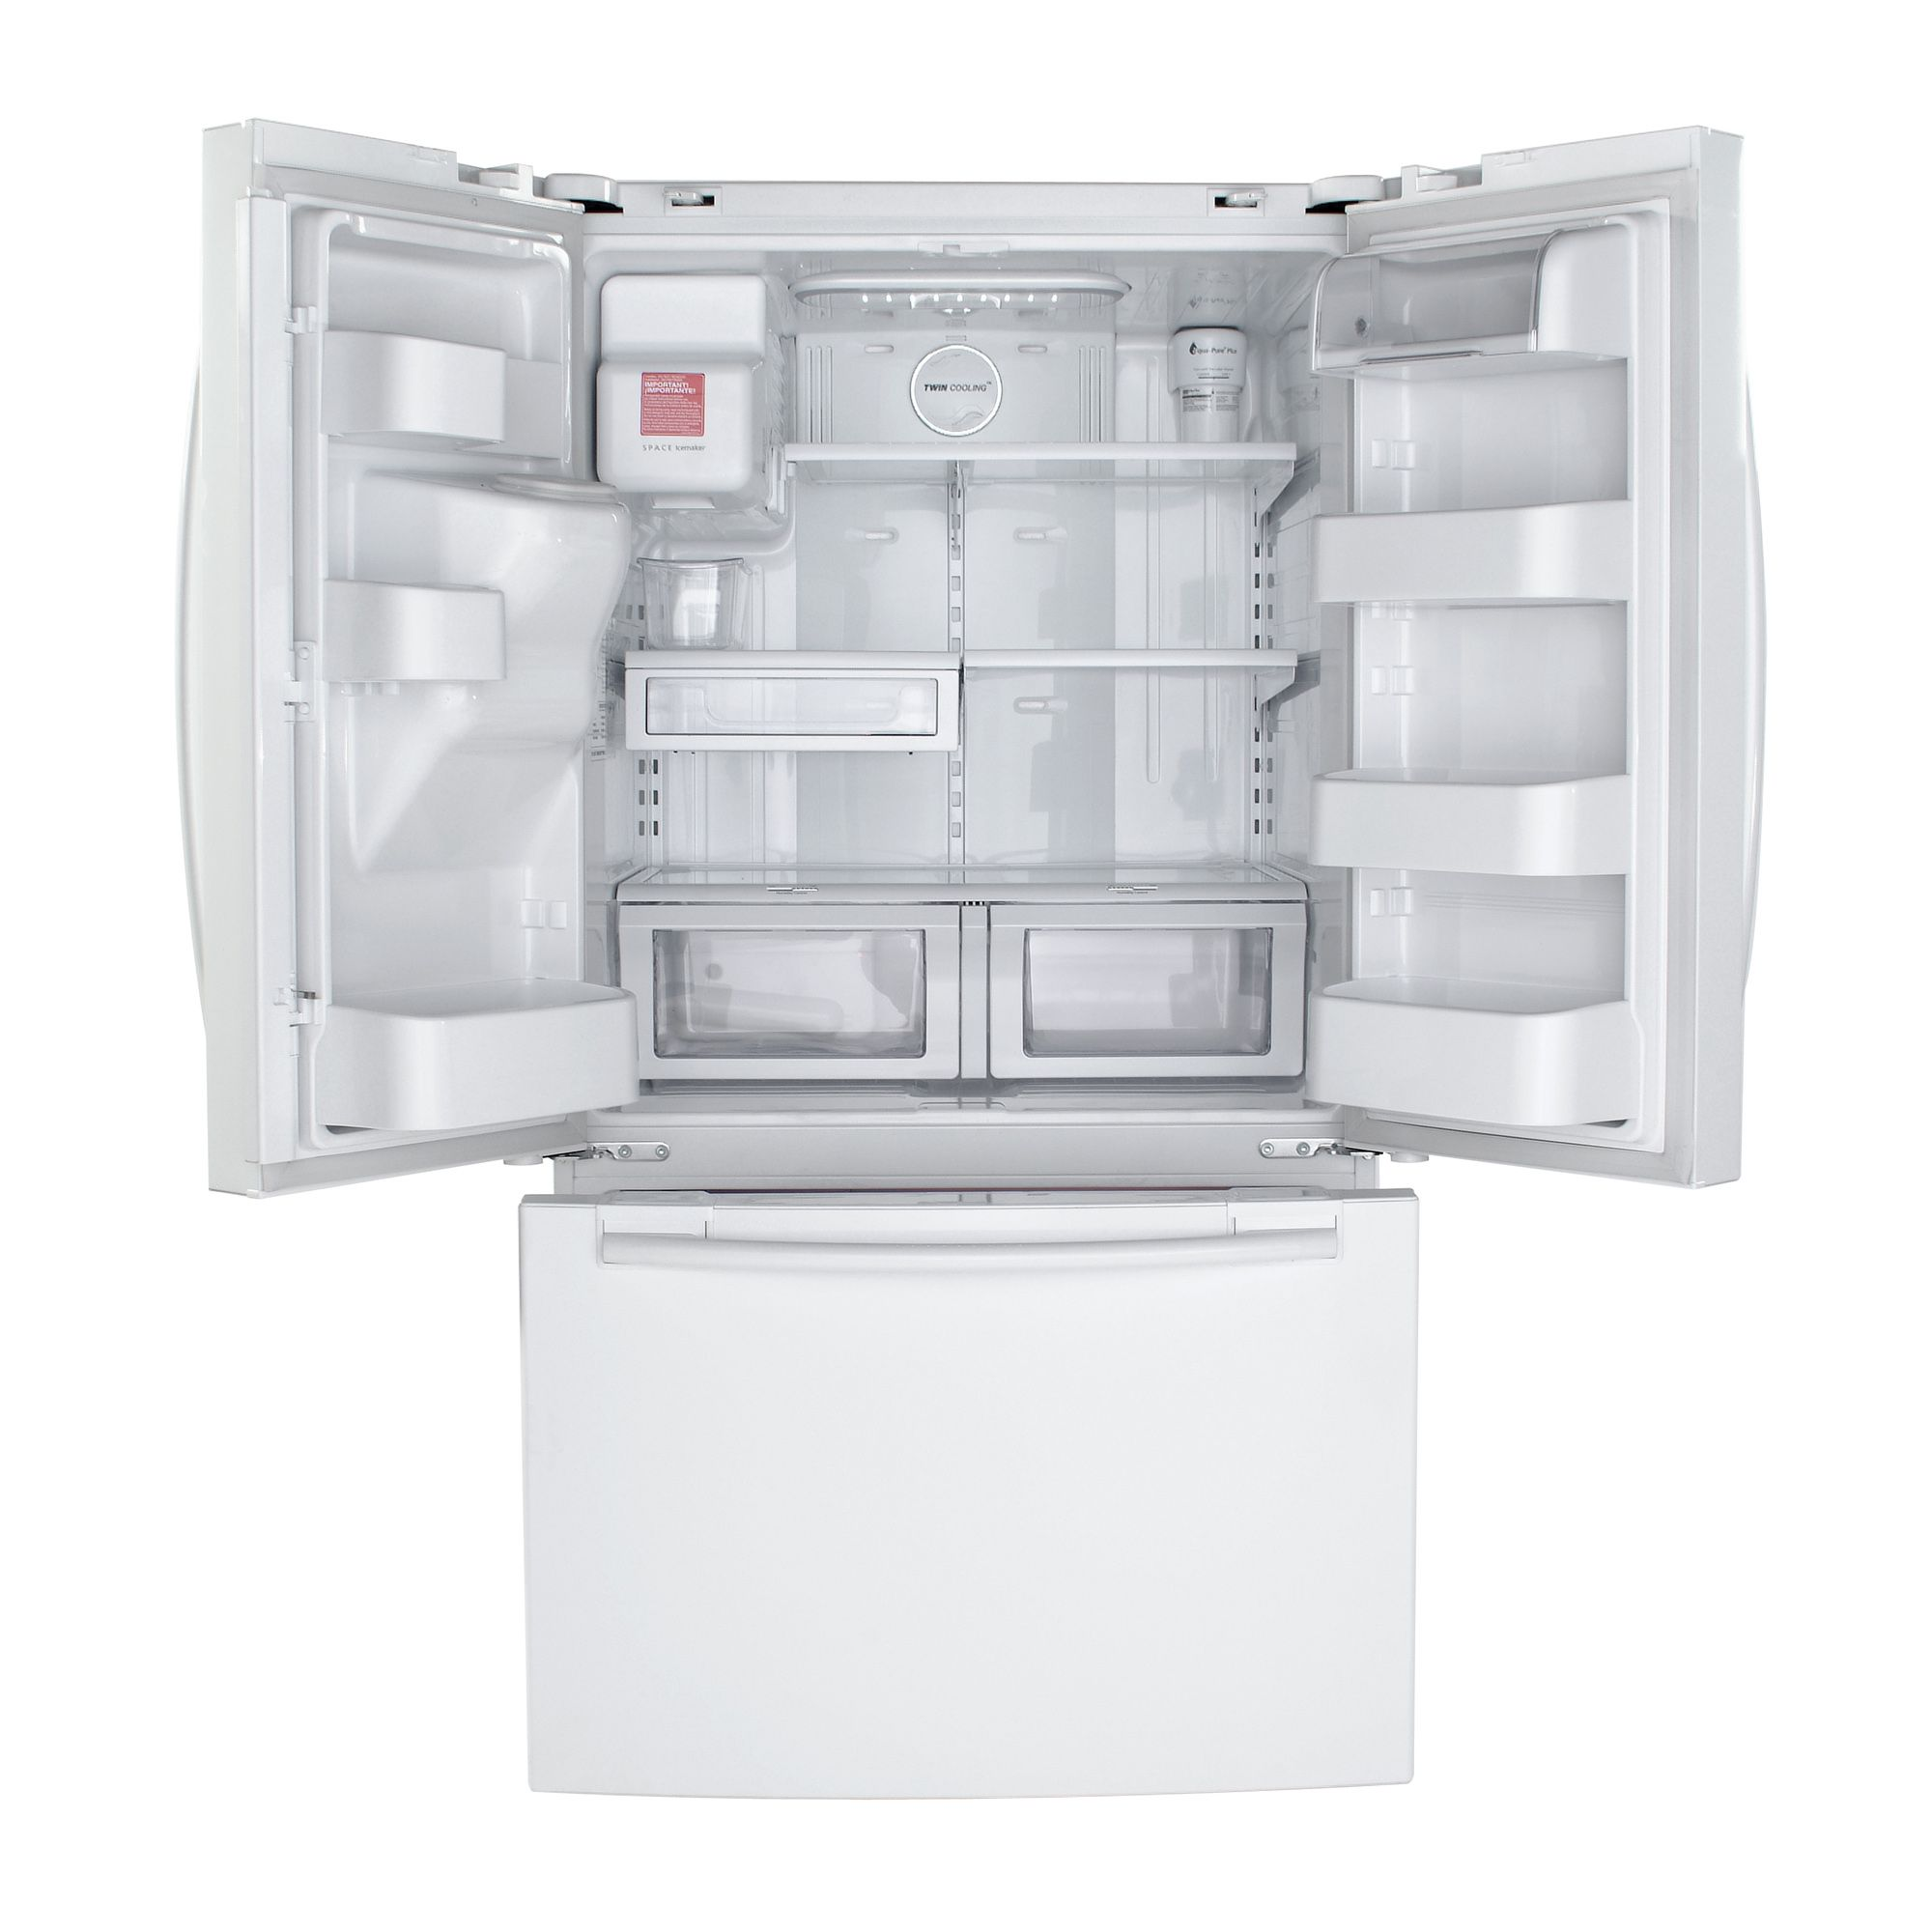 Samsung 26.0 cu. ft. French-Door Bottom Freezer Refrigerator,